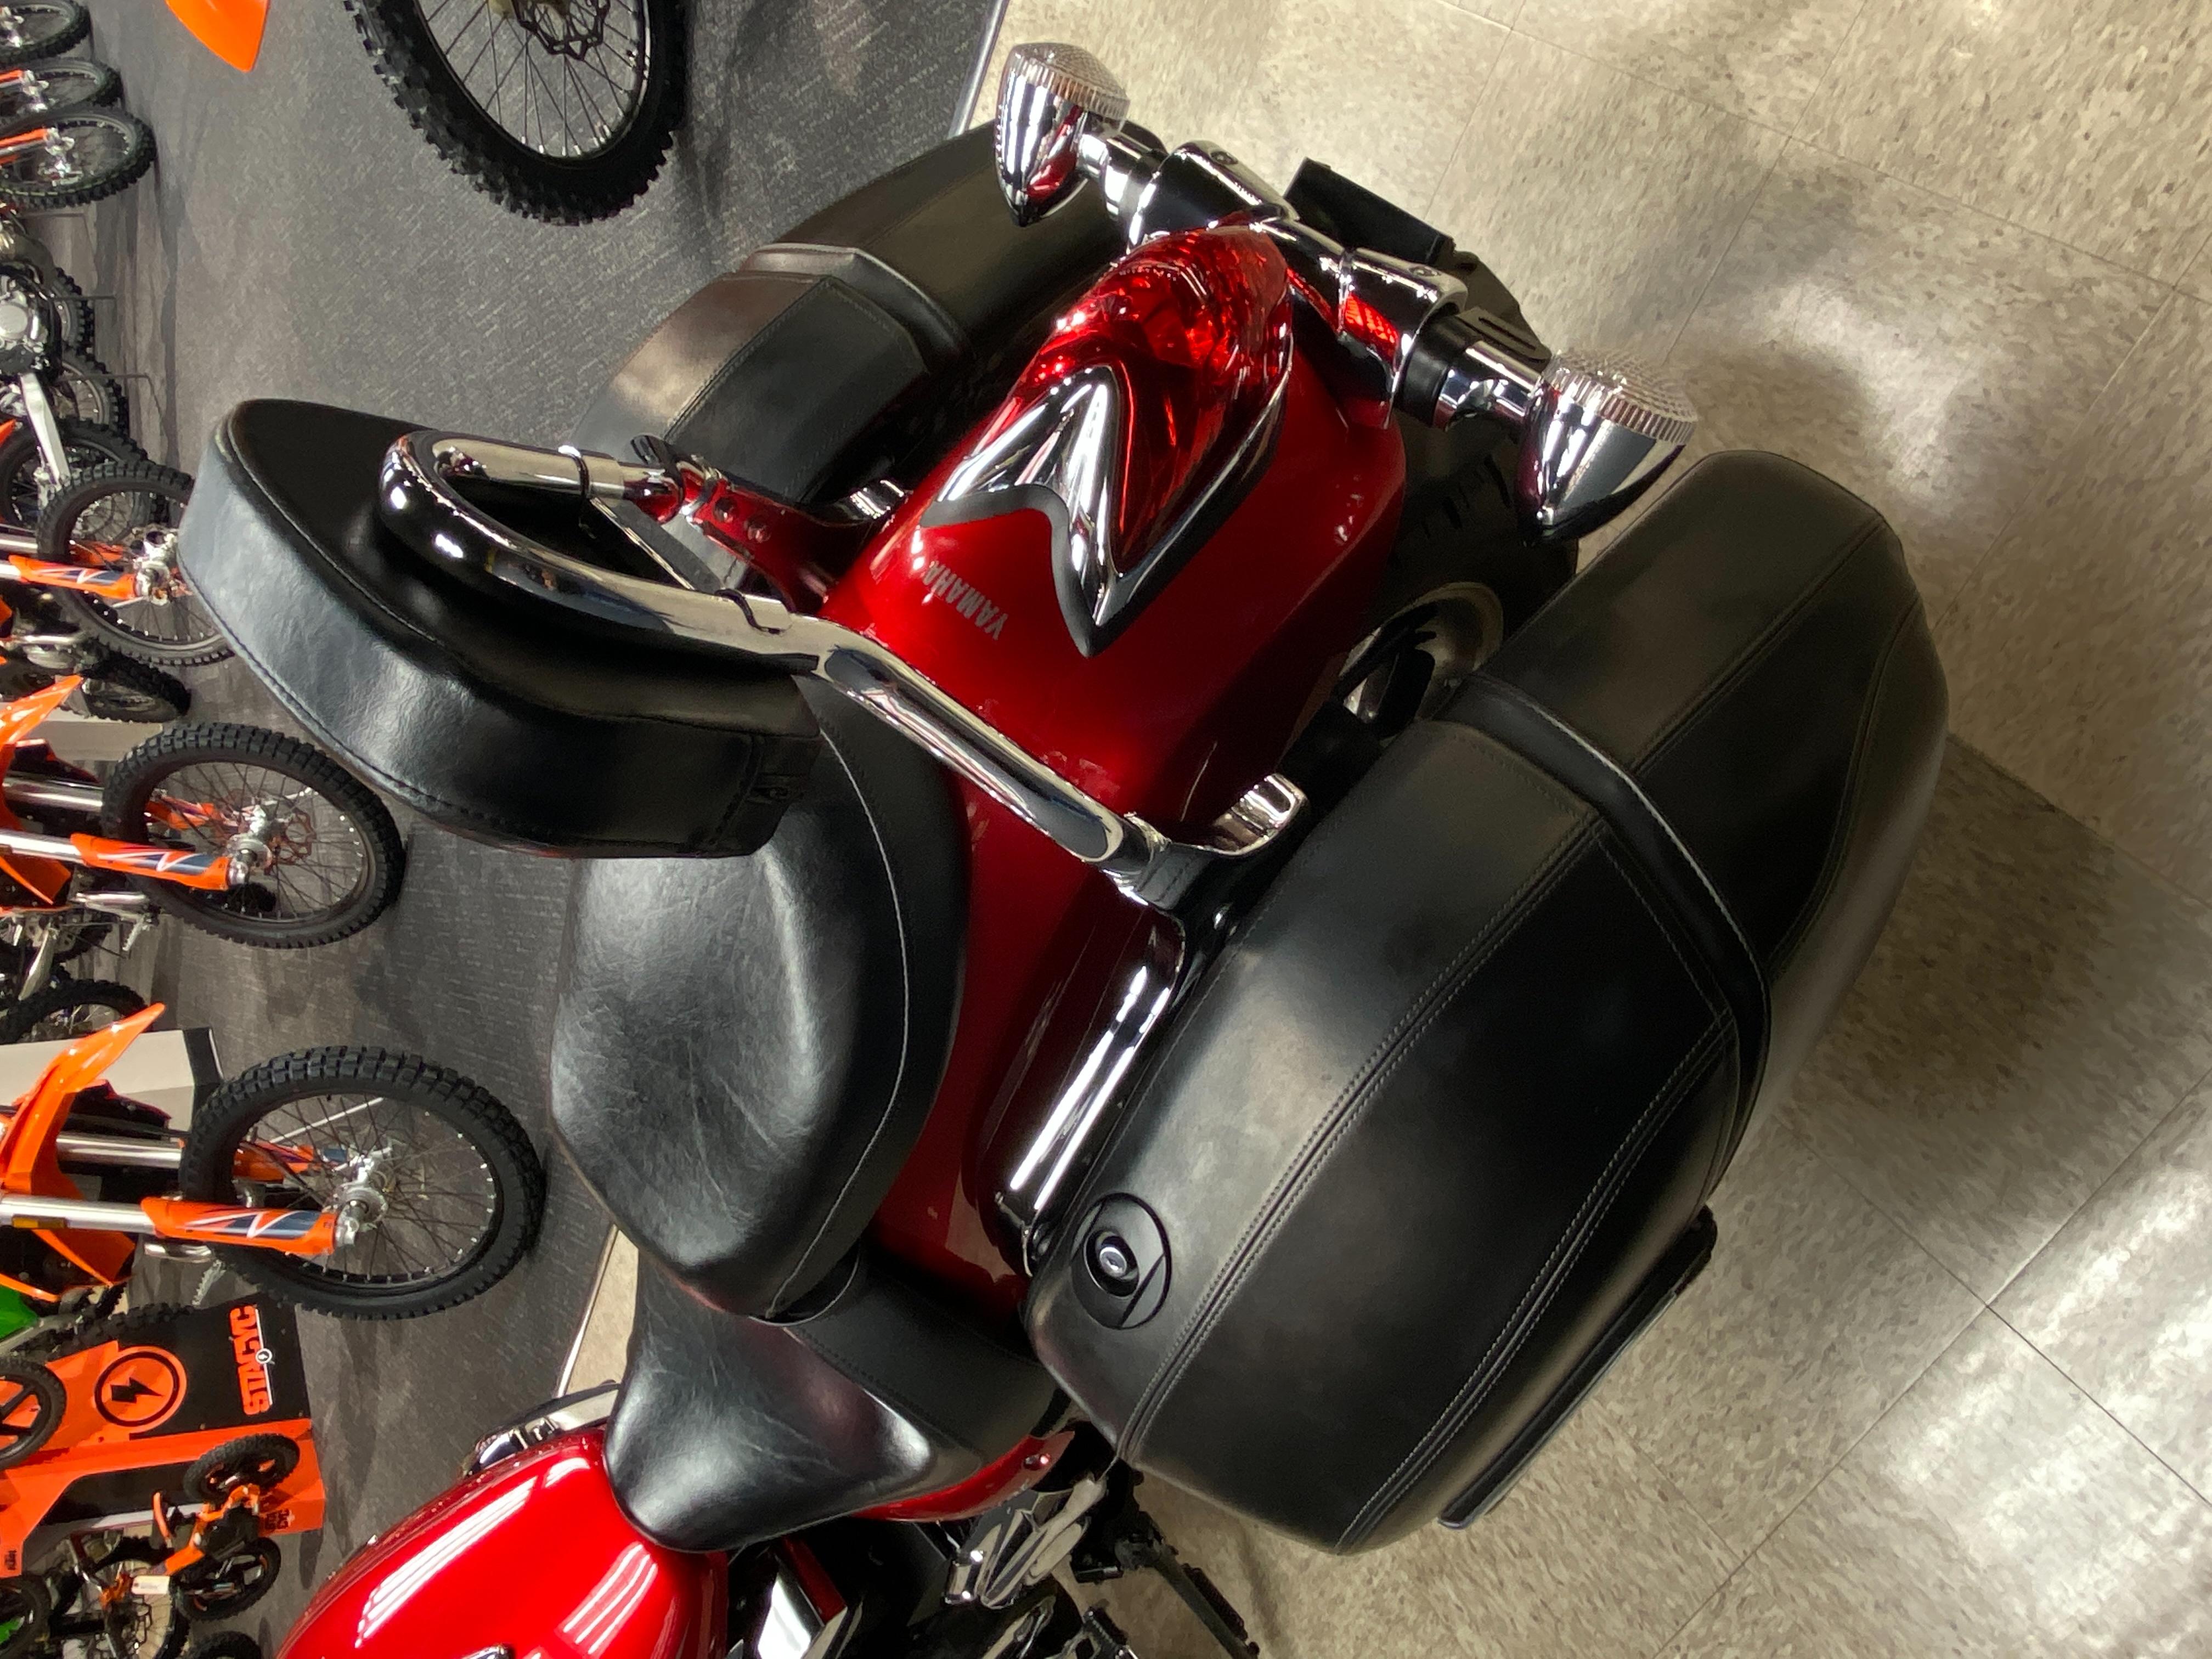 2013 Yamaha V Star 950 Tourer at Sloans Motorcycle ATV, Murfreesboro, TN, 37129